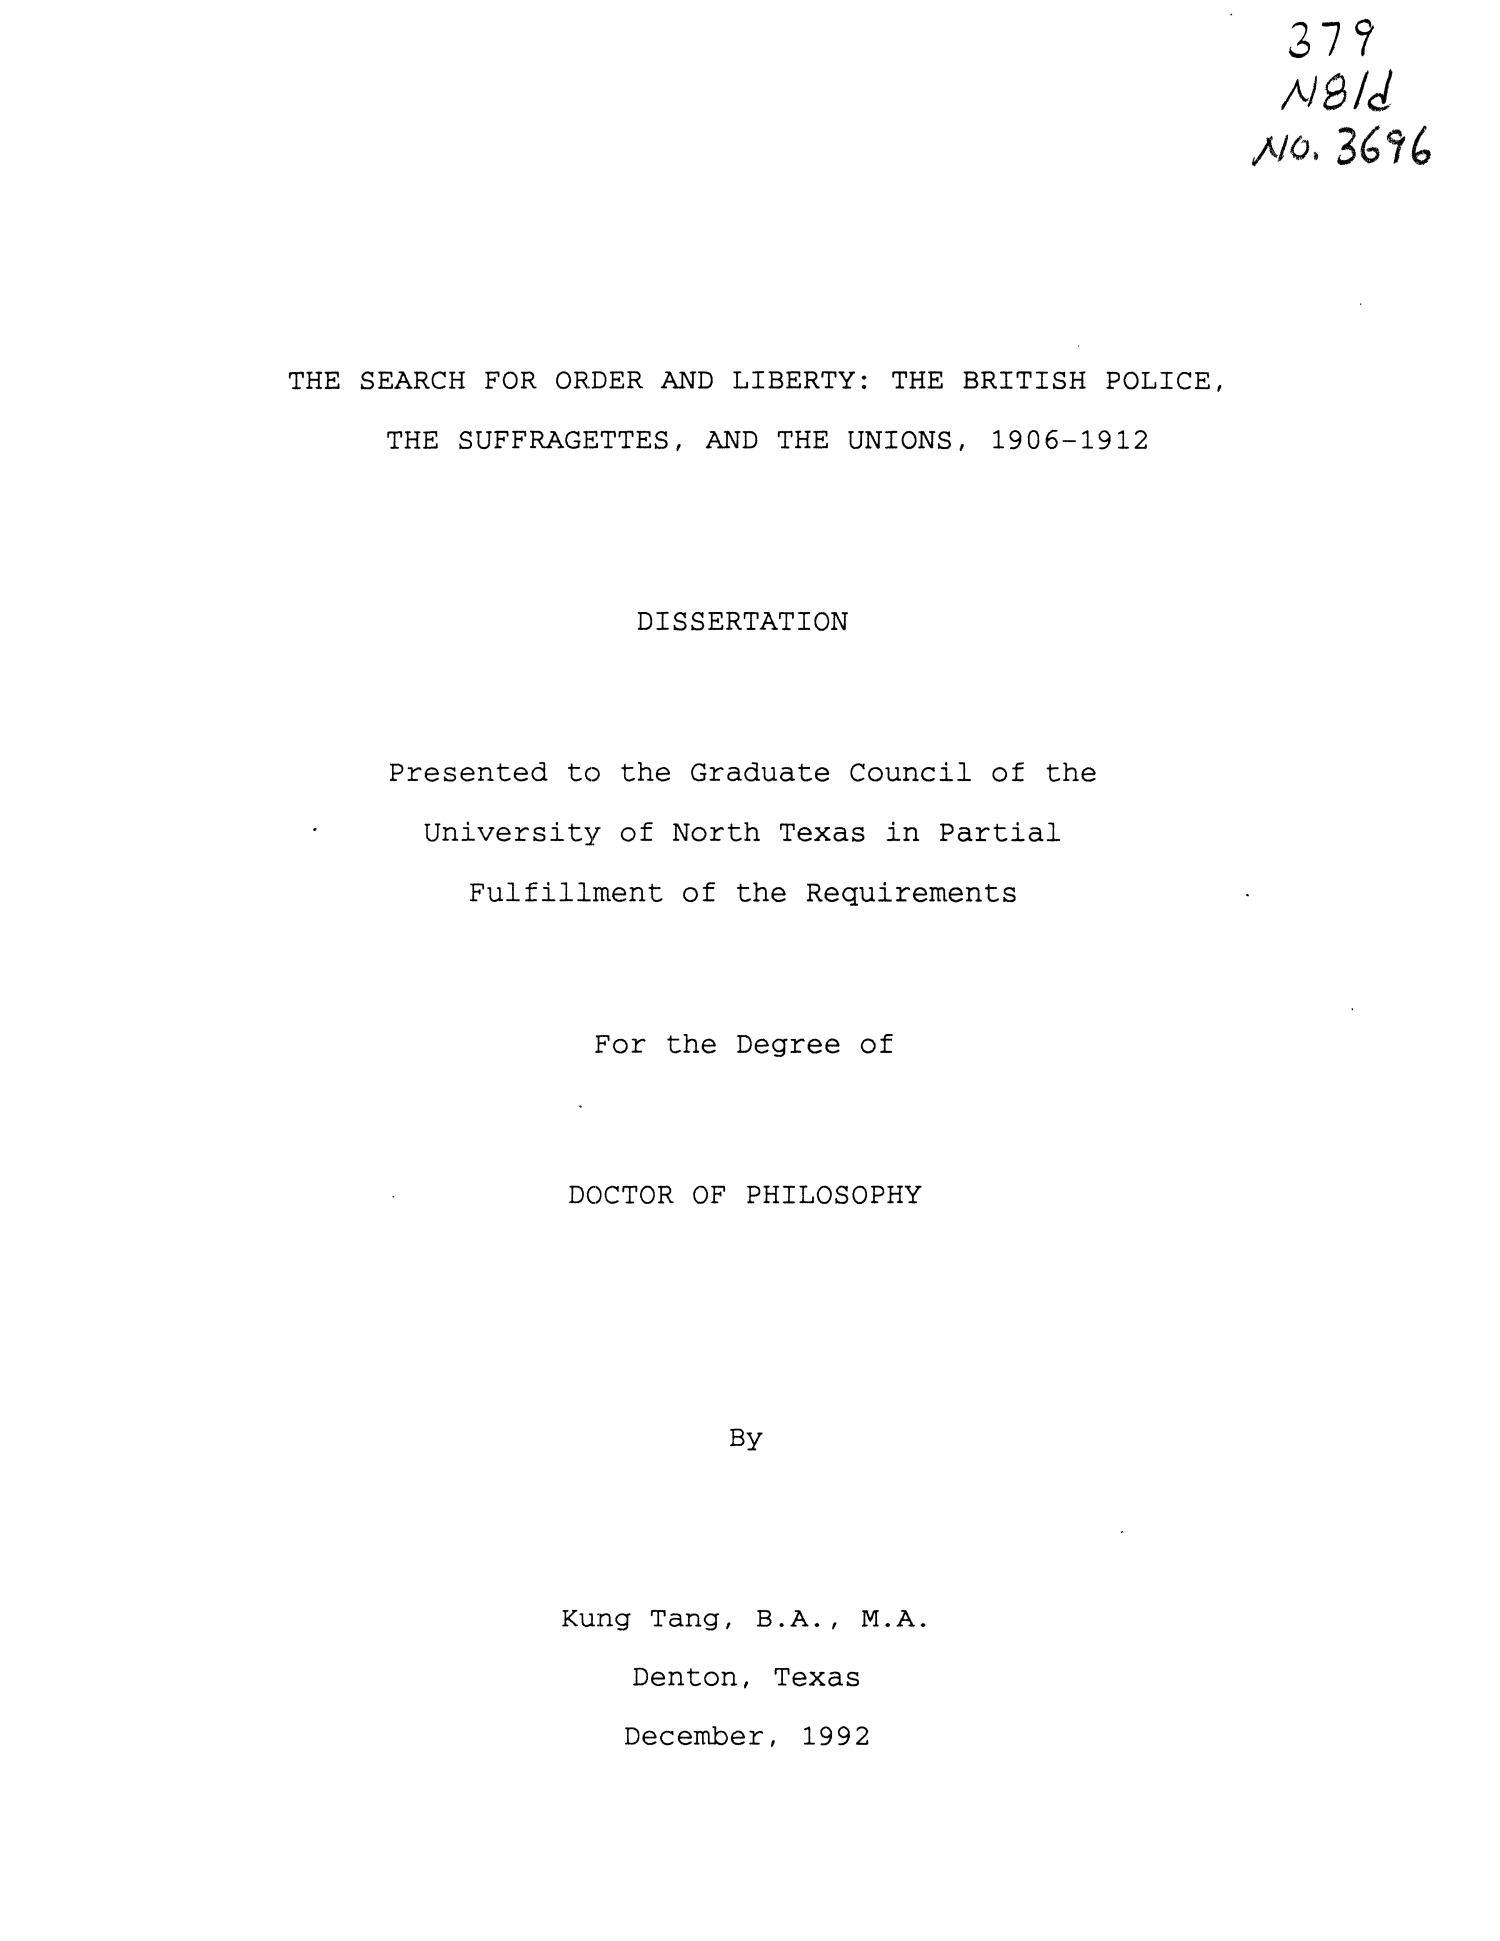 Public order policing dissertation